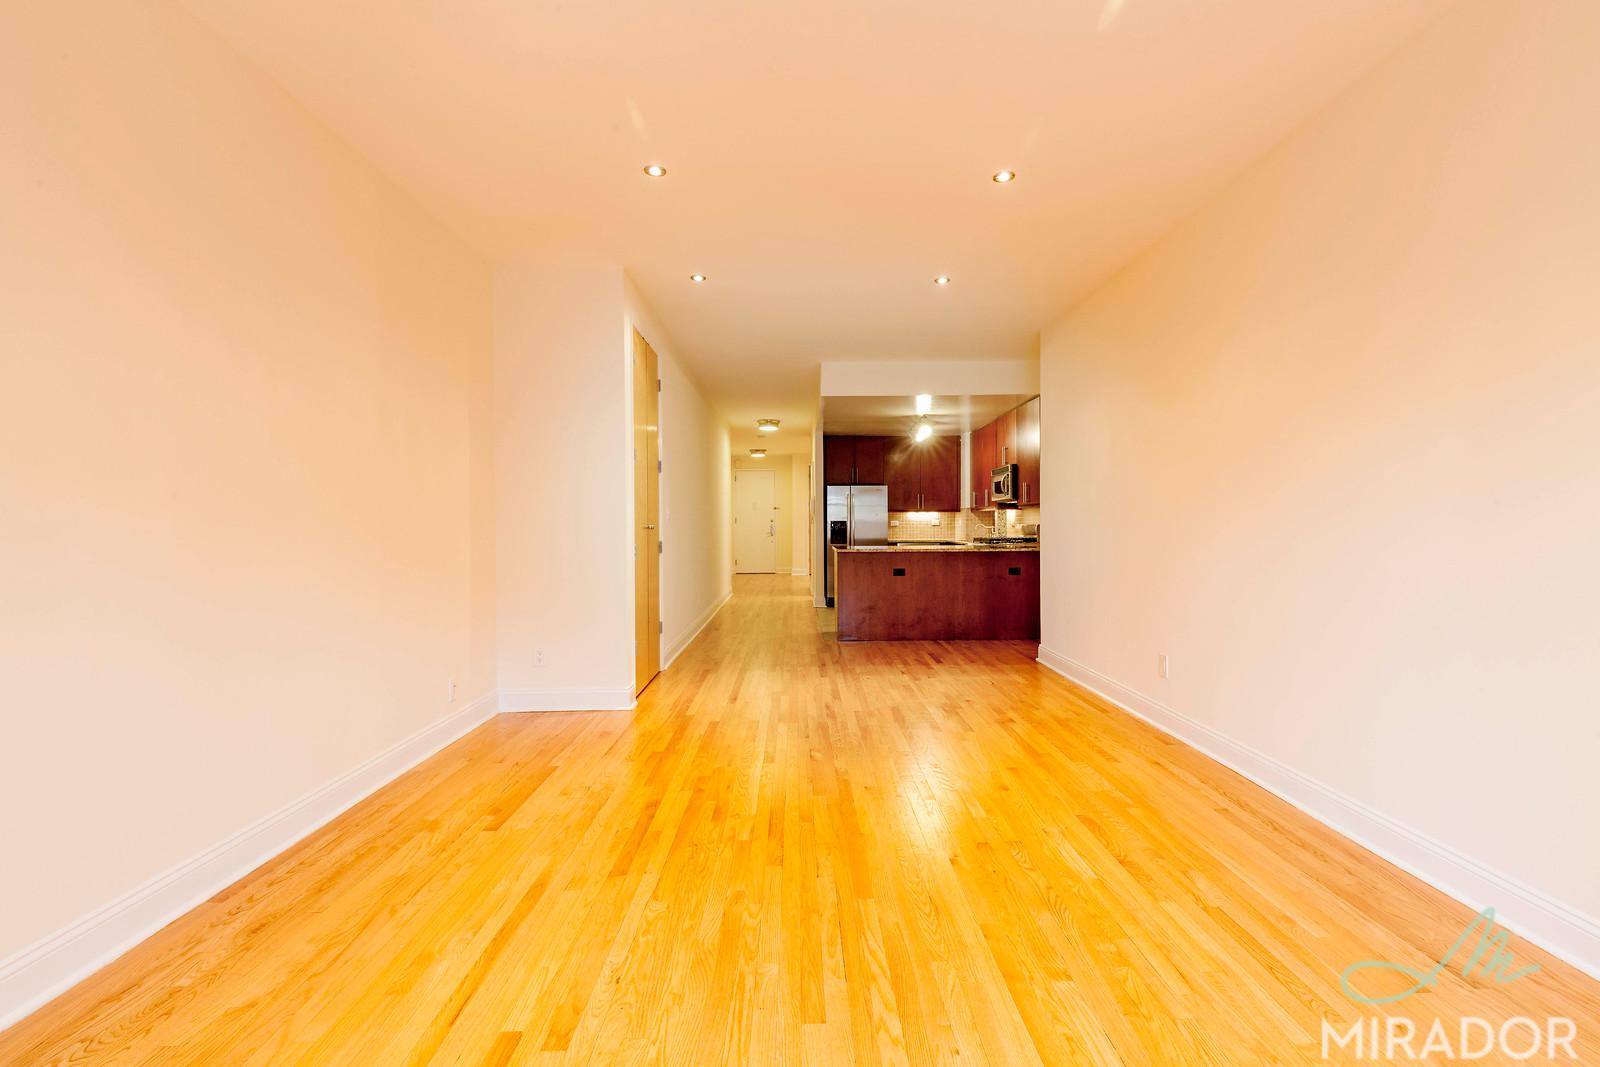 270 Park Avenue South Flatiron District New York NY 10010